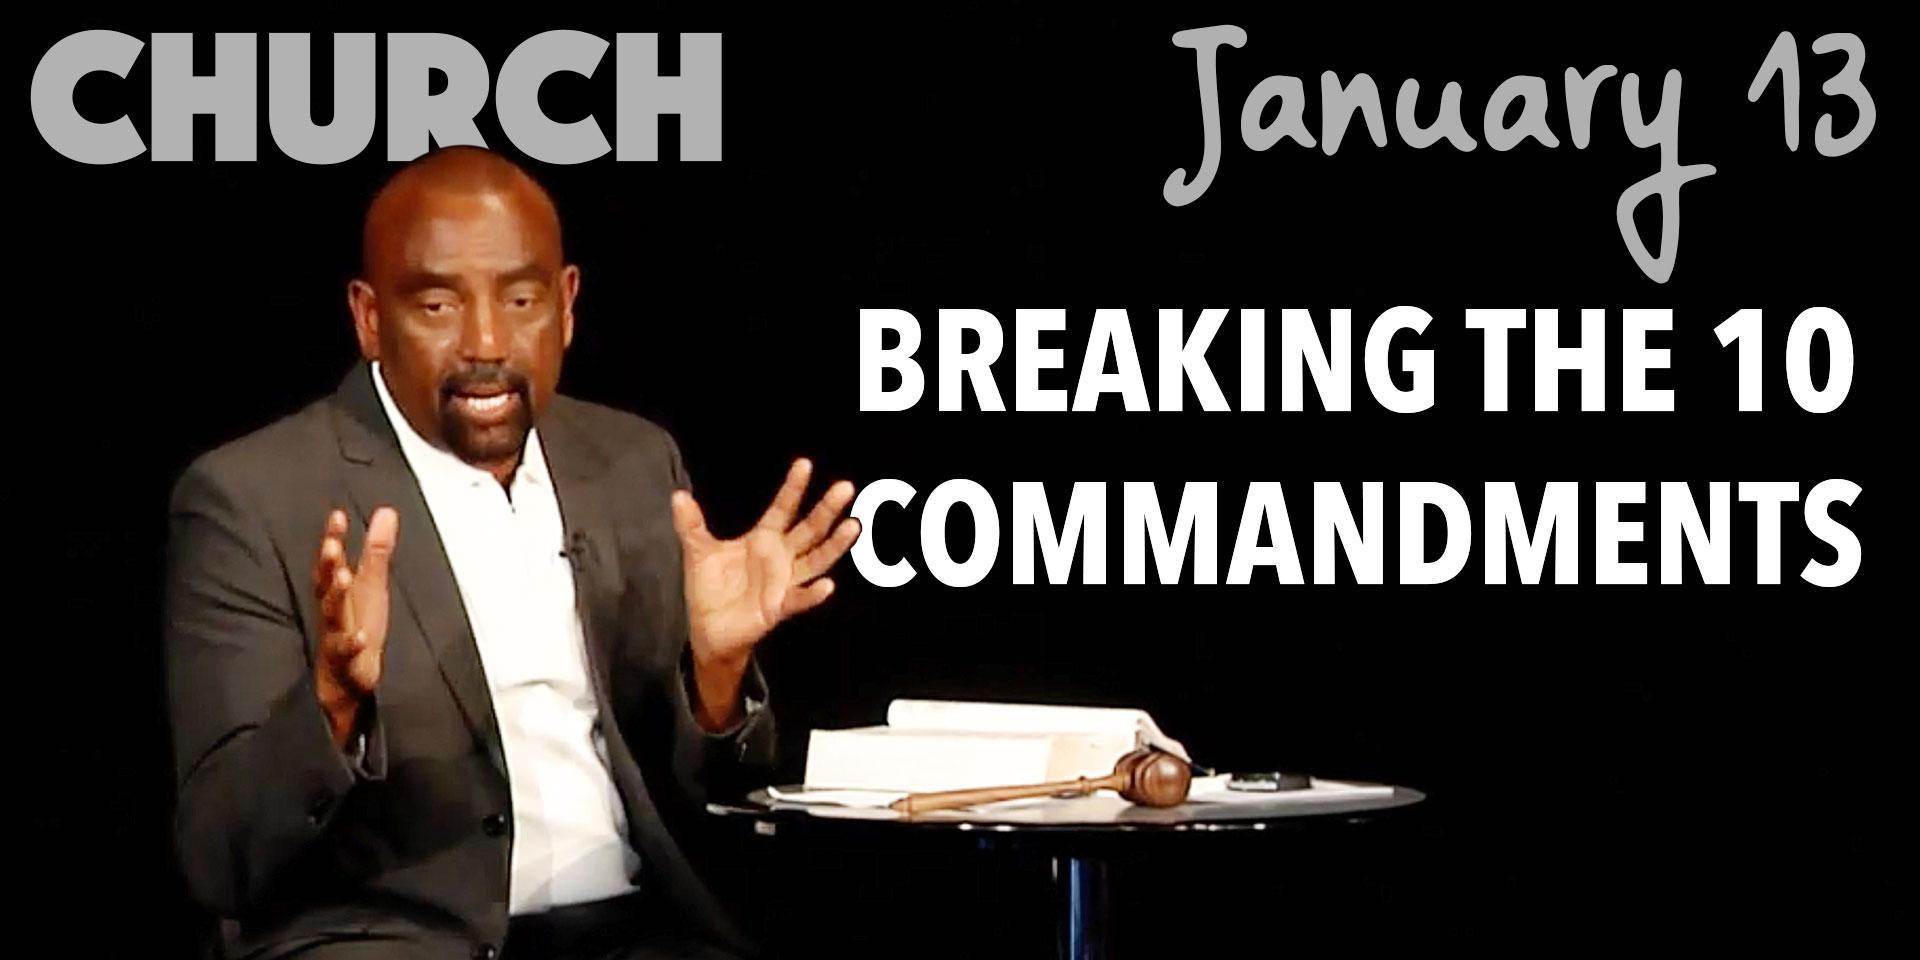 Church Jan 13: Christians Breaking the 10 Commandments